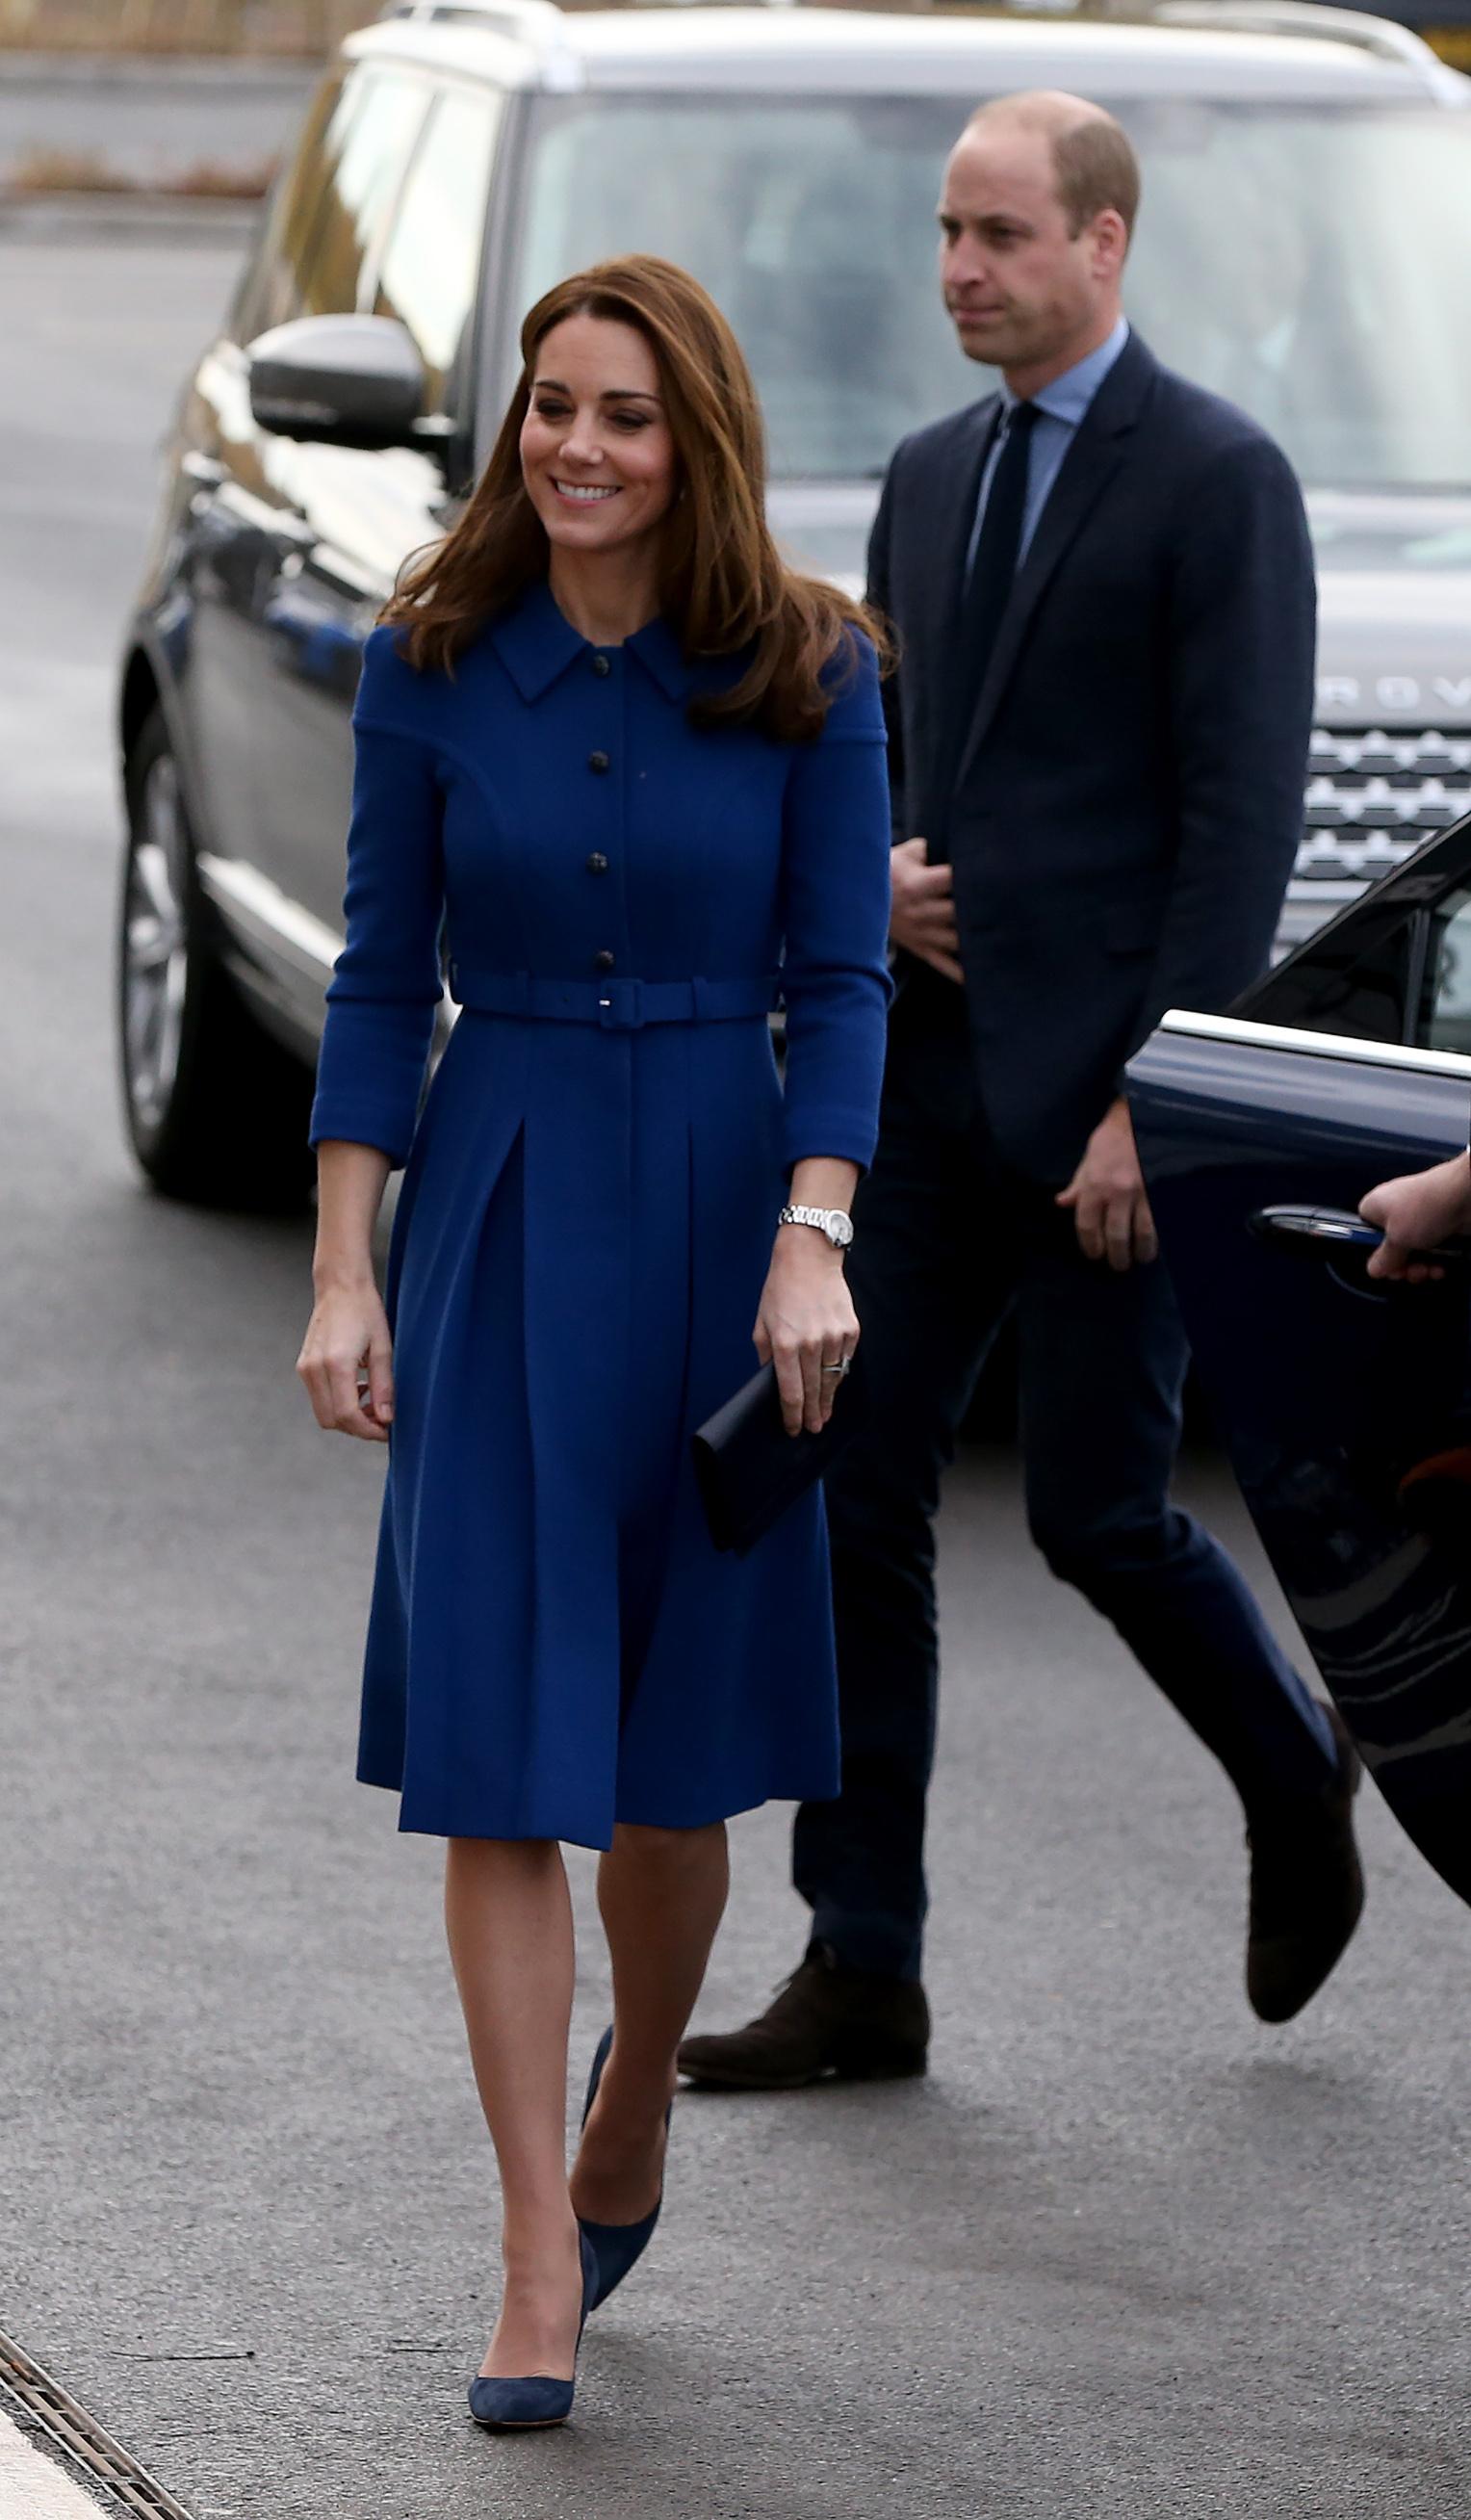 ROTHERHAM, ENGLAND - NOVEMBER 14: Catherine, Duchess Of Cambridge and Prince William, Duke of Cambridge visit McLaren Automotive Composites Technology Centre on November 14, 2018 in Rotherham, England. (Photo by Nigel Roddis/Getty Images)